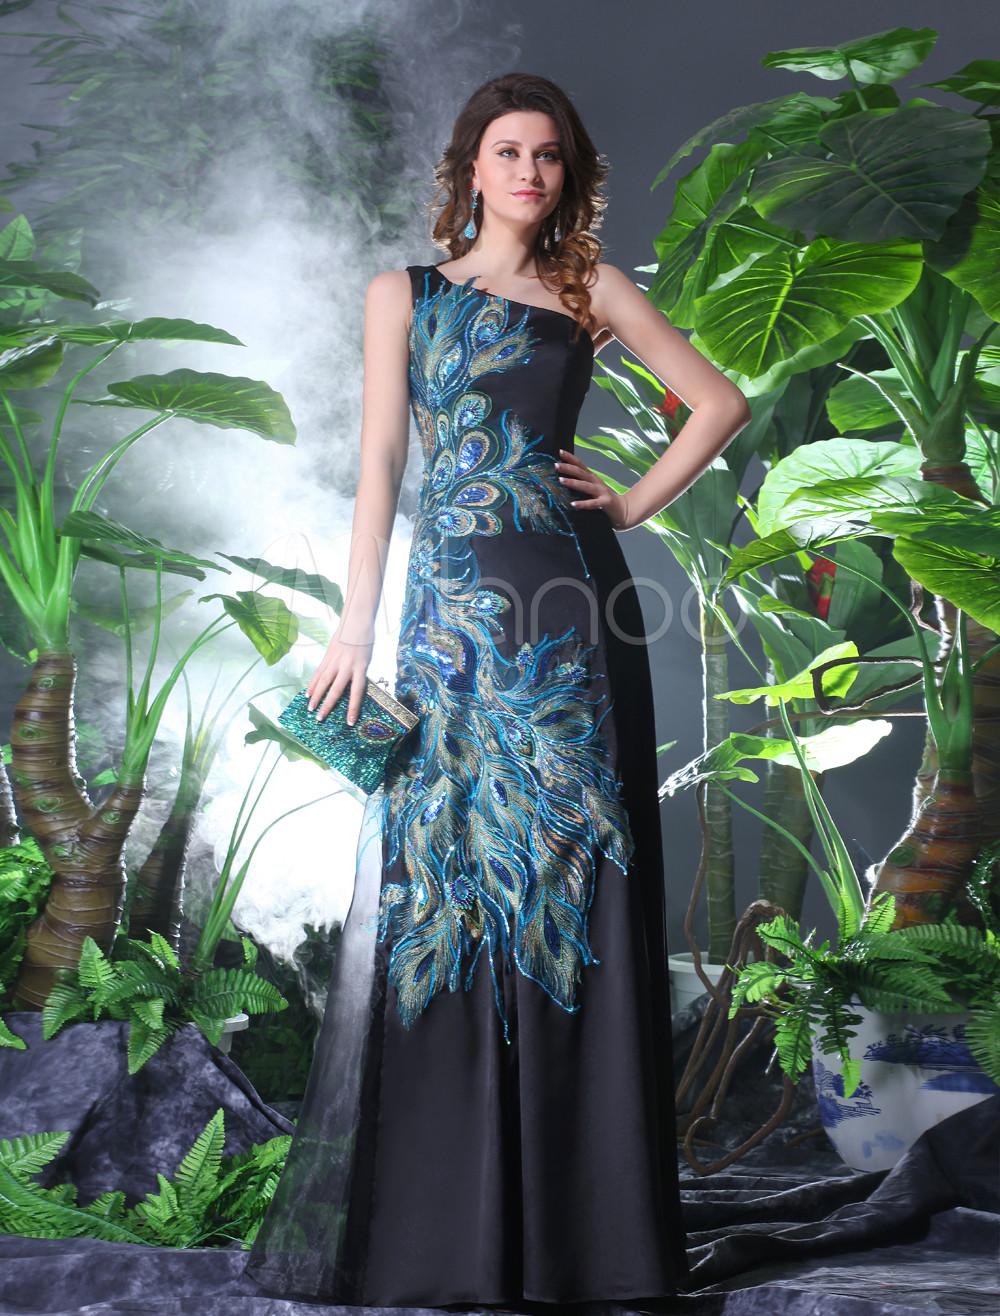 One-Shoulder Peacock Print Evening Dress Wedding Guest Dress Milanoo (Evening Dresses) photo